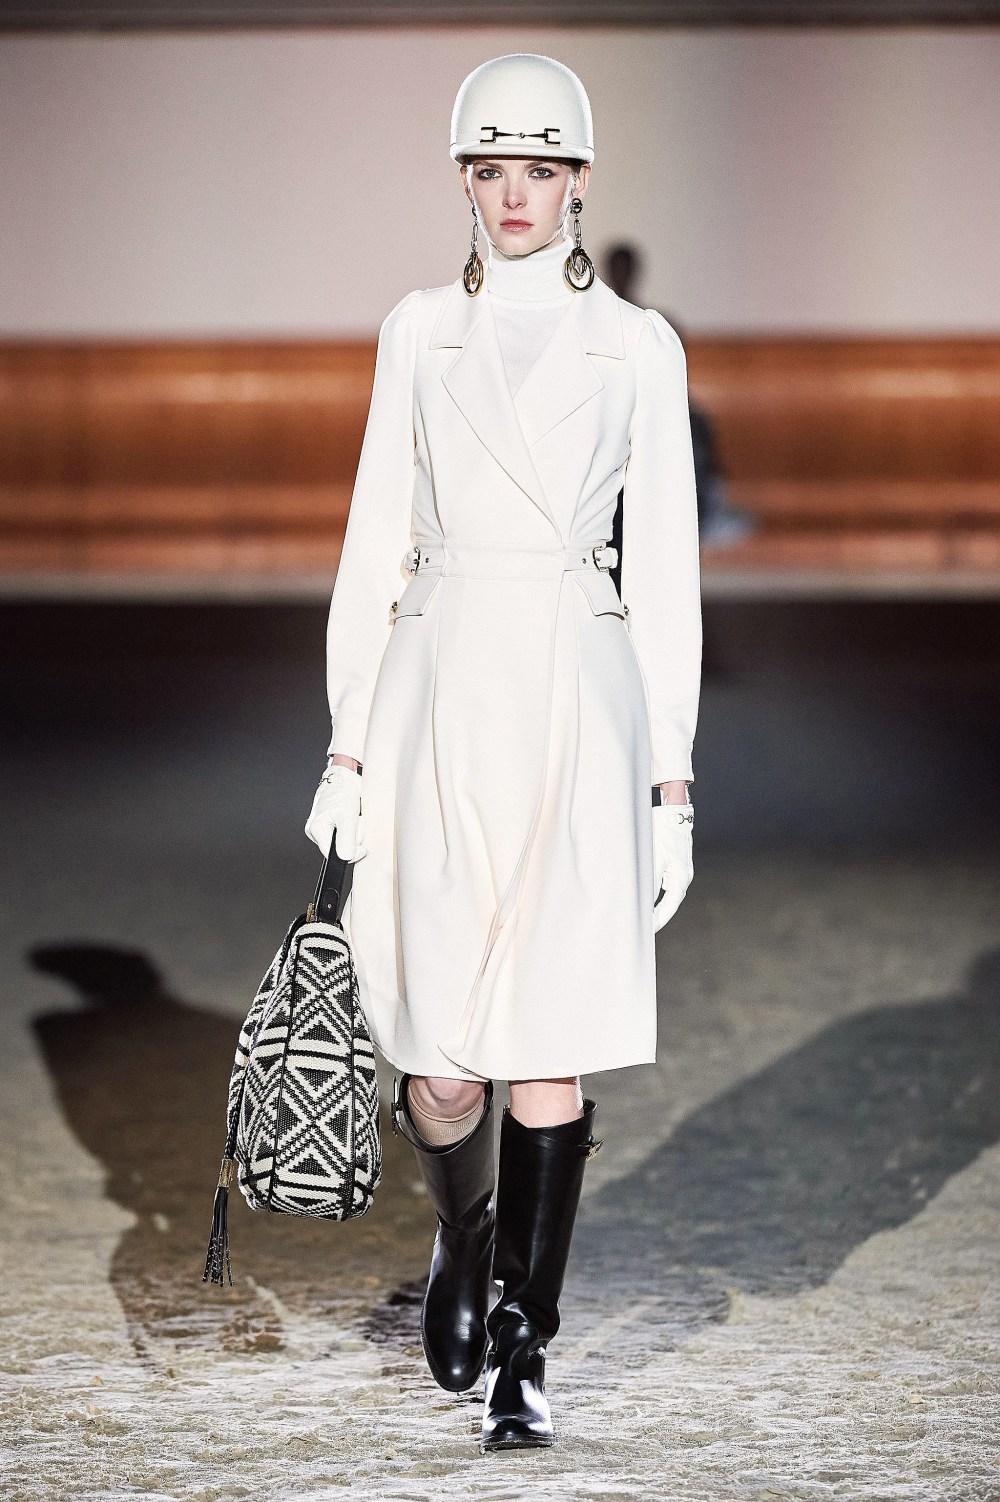 Elisabetta Franchi: Elisabetta Franchi Fall Winter 2021-22 Fashion Show Photo #51